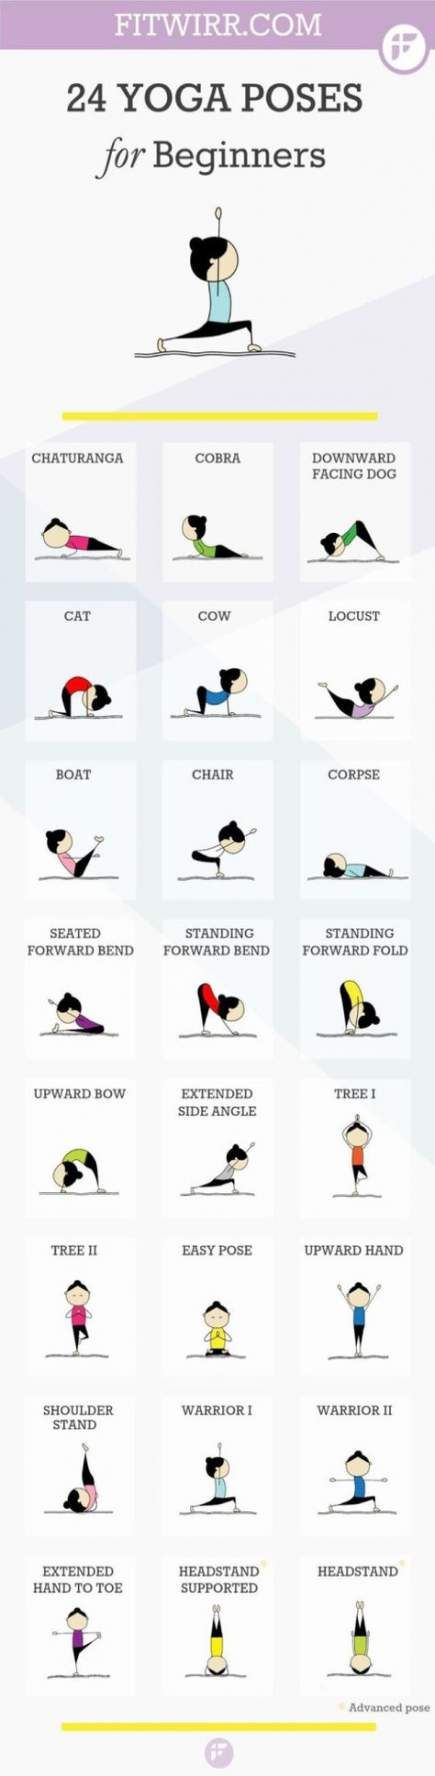 Fitness Motivation Photo Namaste 45 Ideas #motivation #fitness